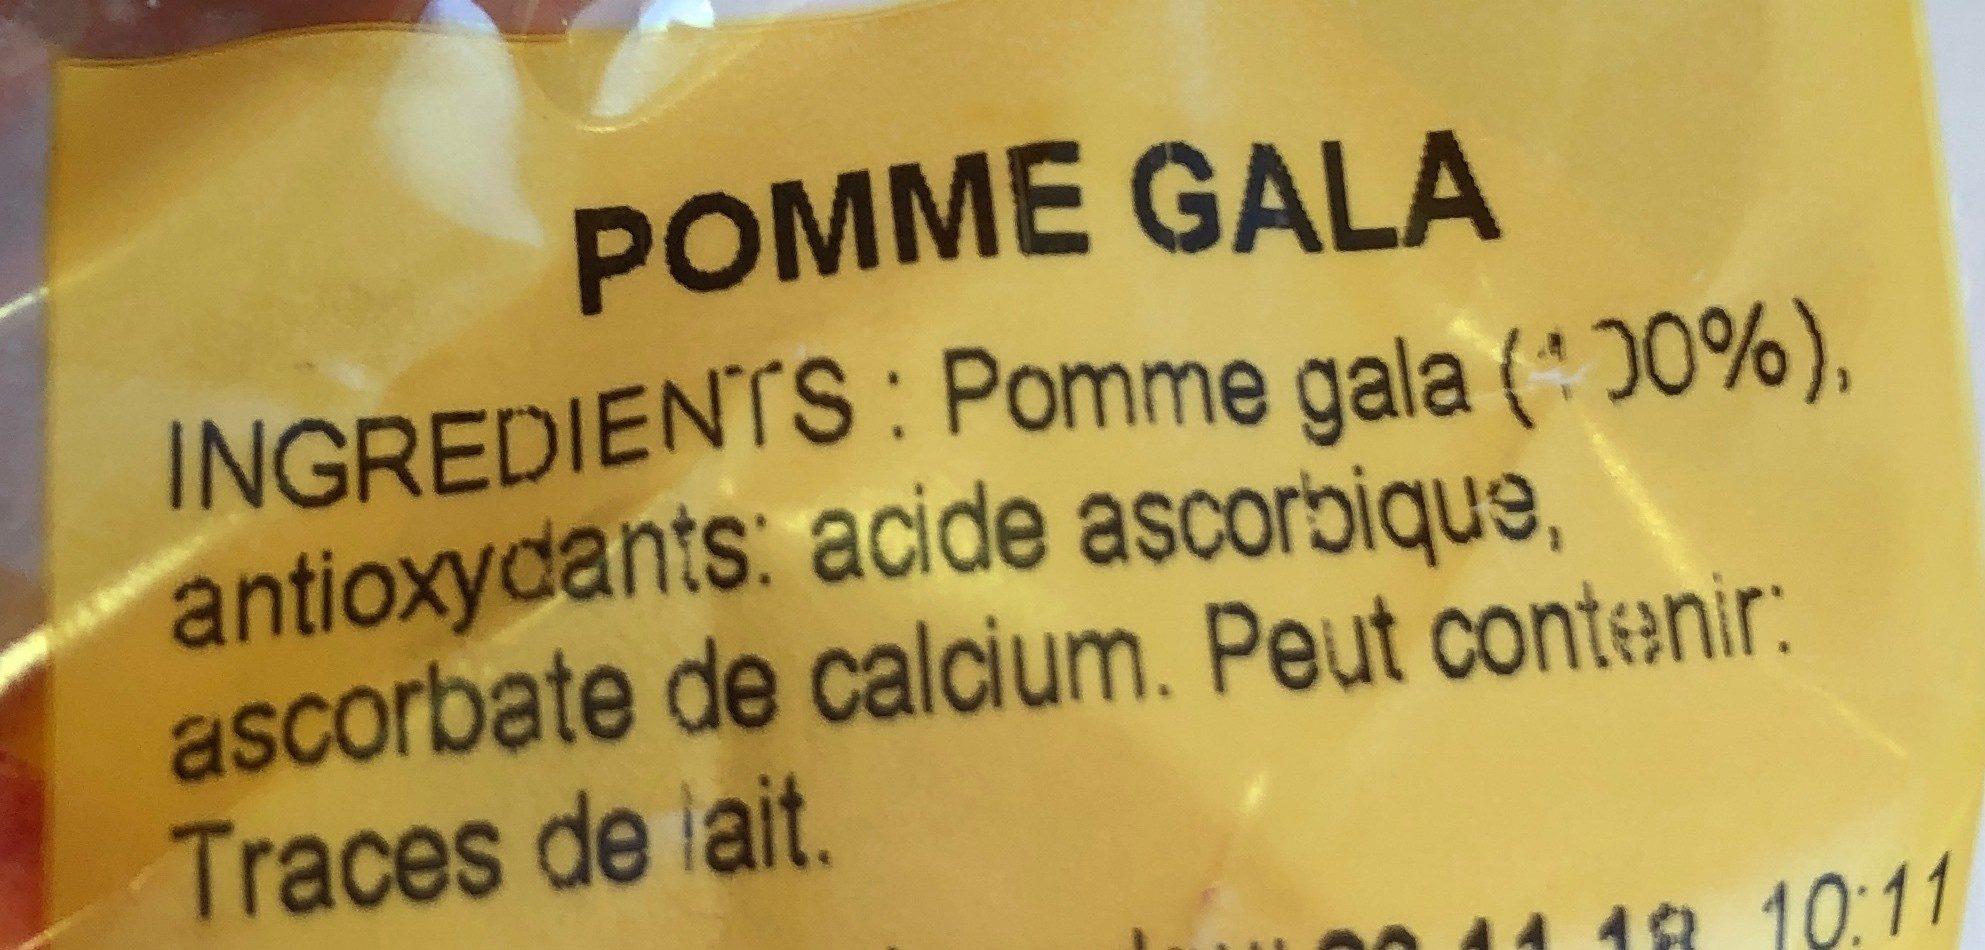 Les fruits by KFC - Ingrédients - fr